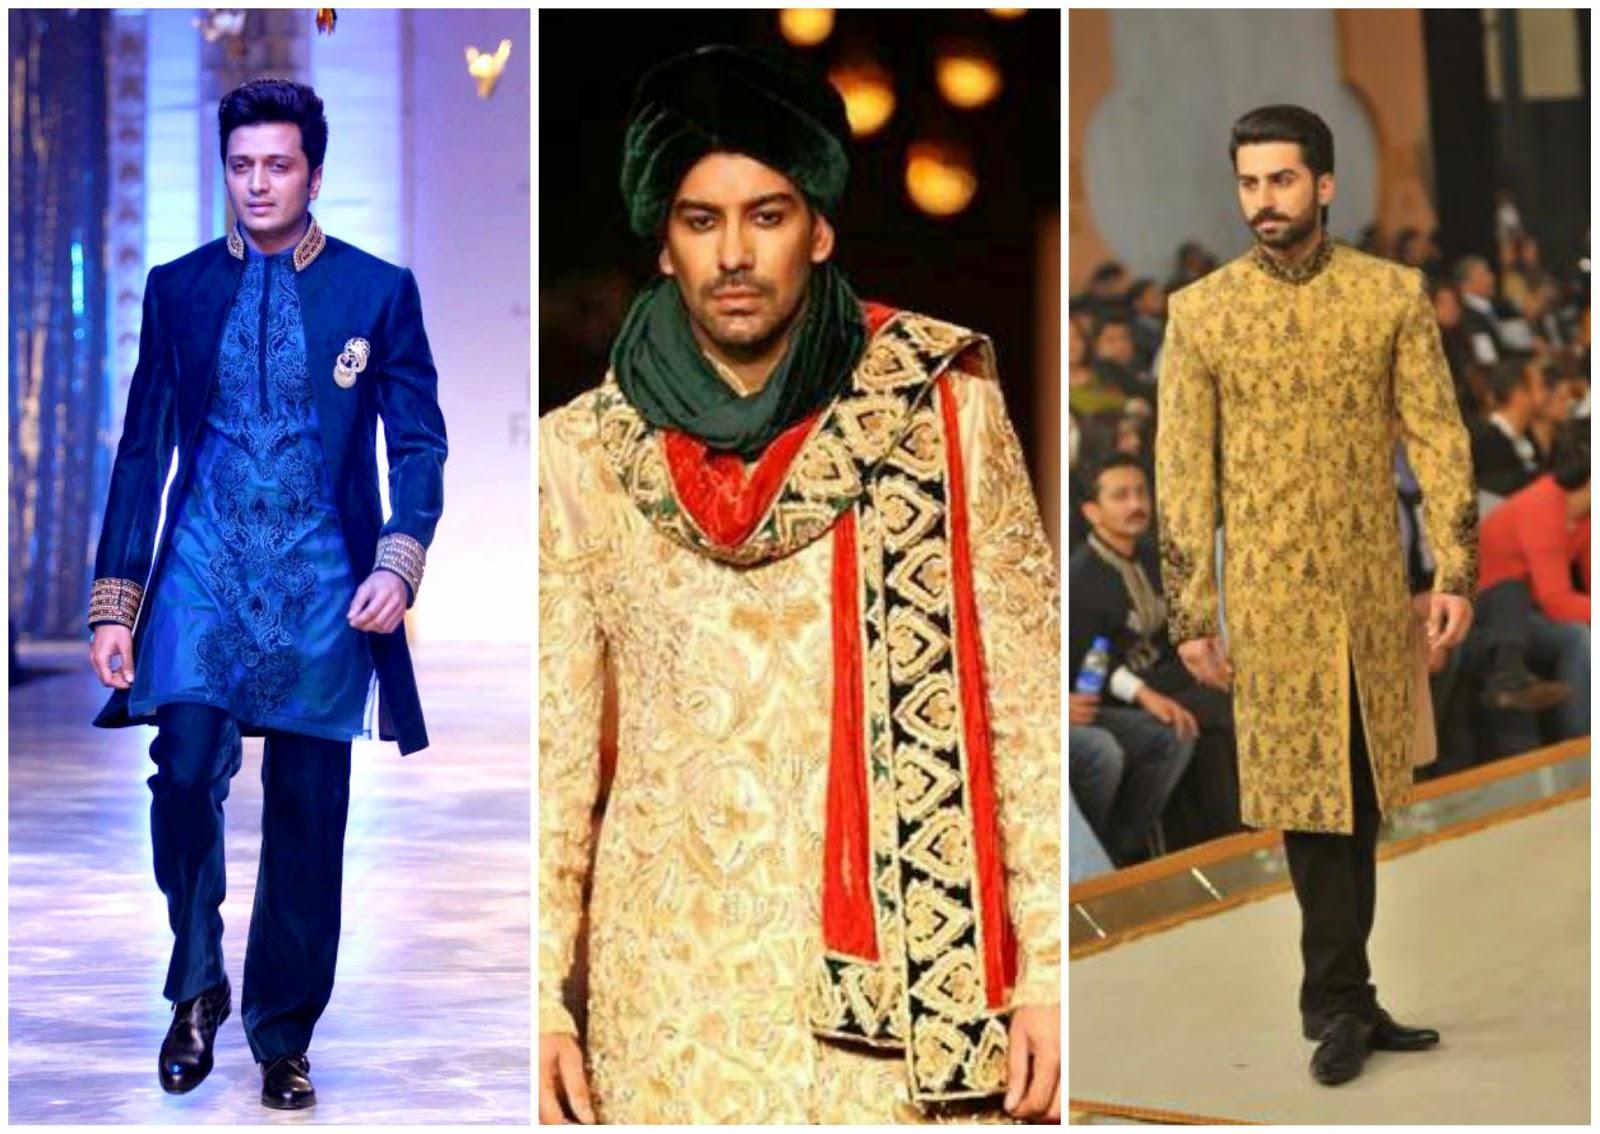 Designer wedding sherwani, ritest deshmukh in sherwani, bollywood sherwani styles